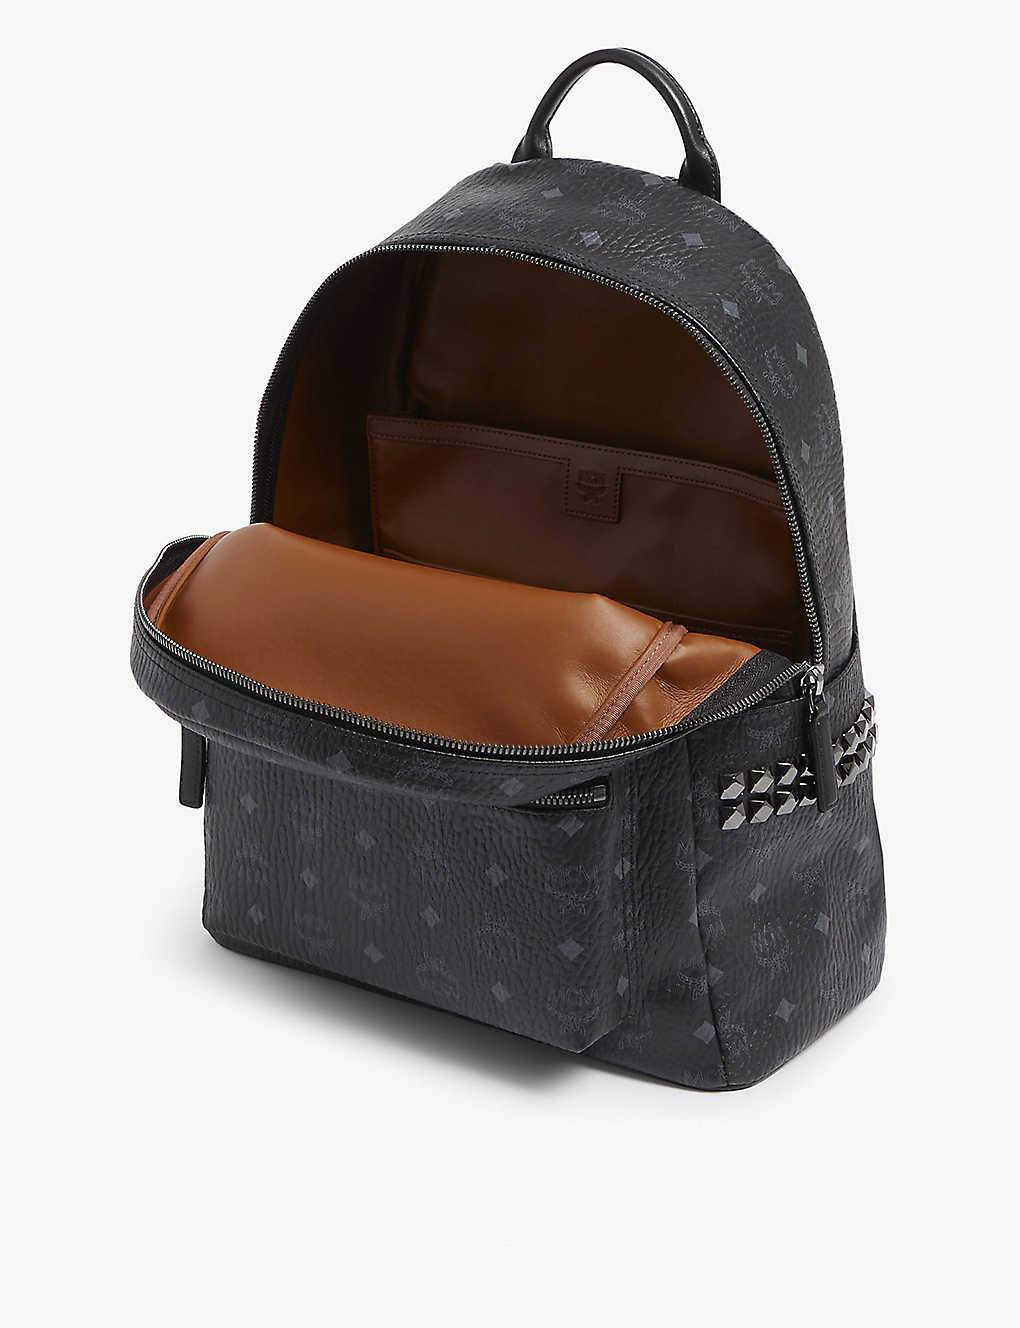 83f05c9e81b9e MCM - Medium stark backpack | Selfridges.com